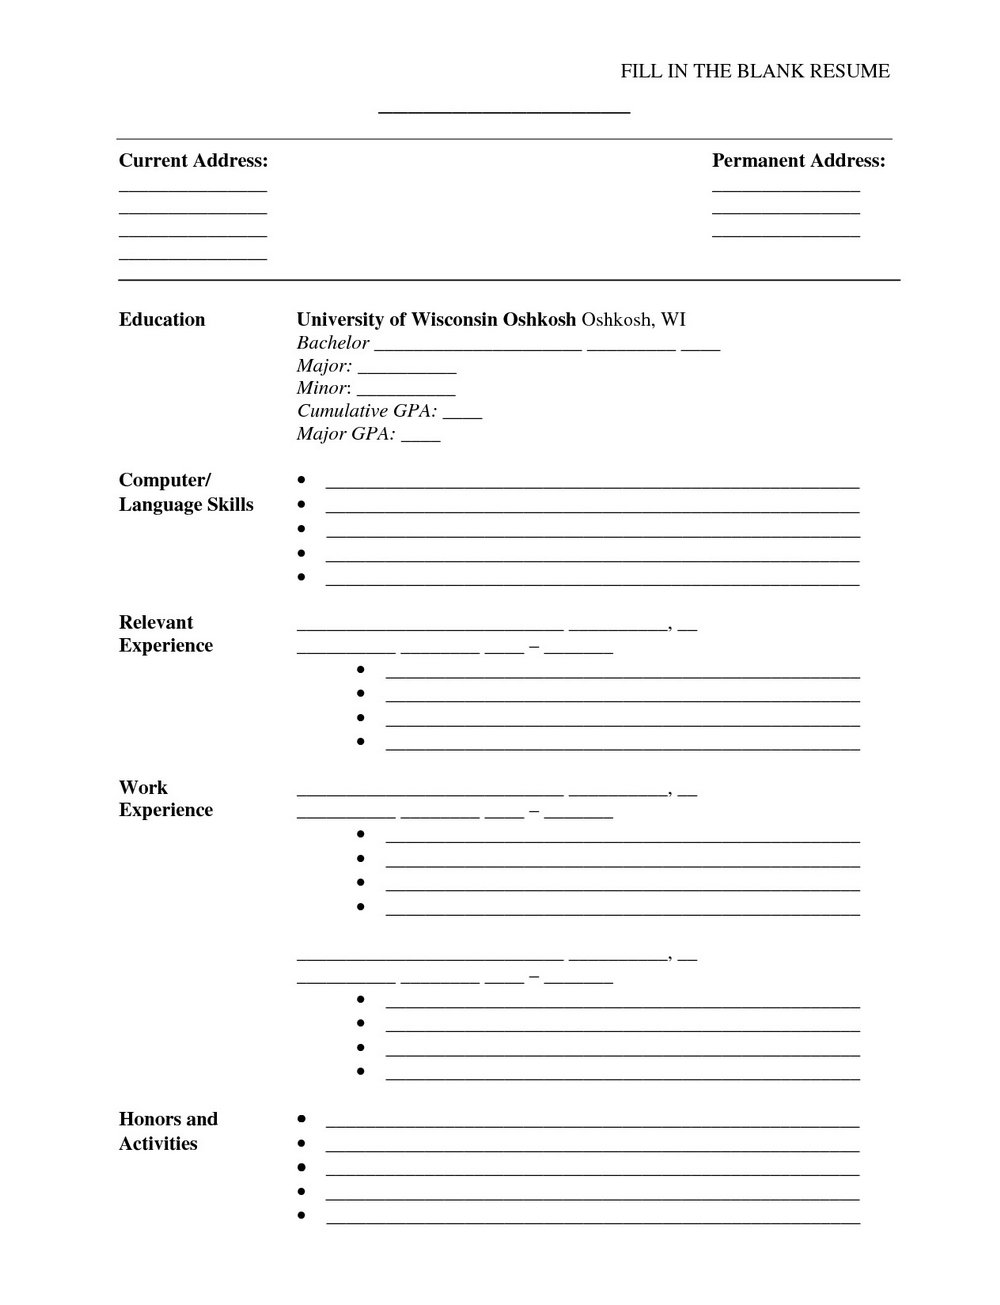 Blank Resume Form Pdf